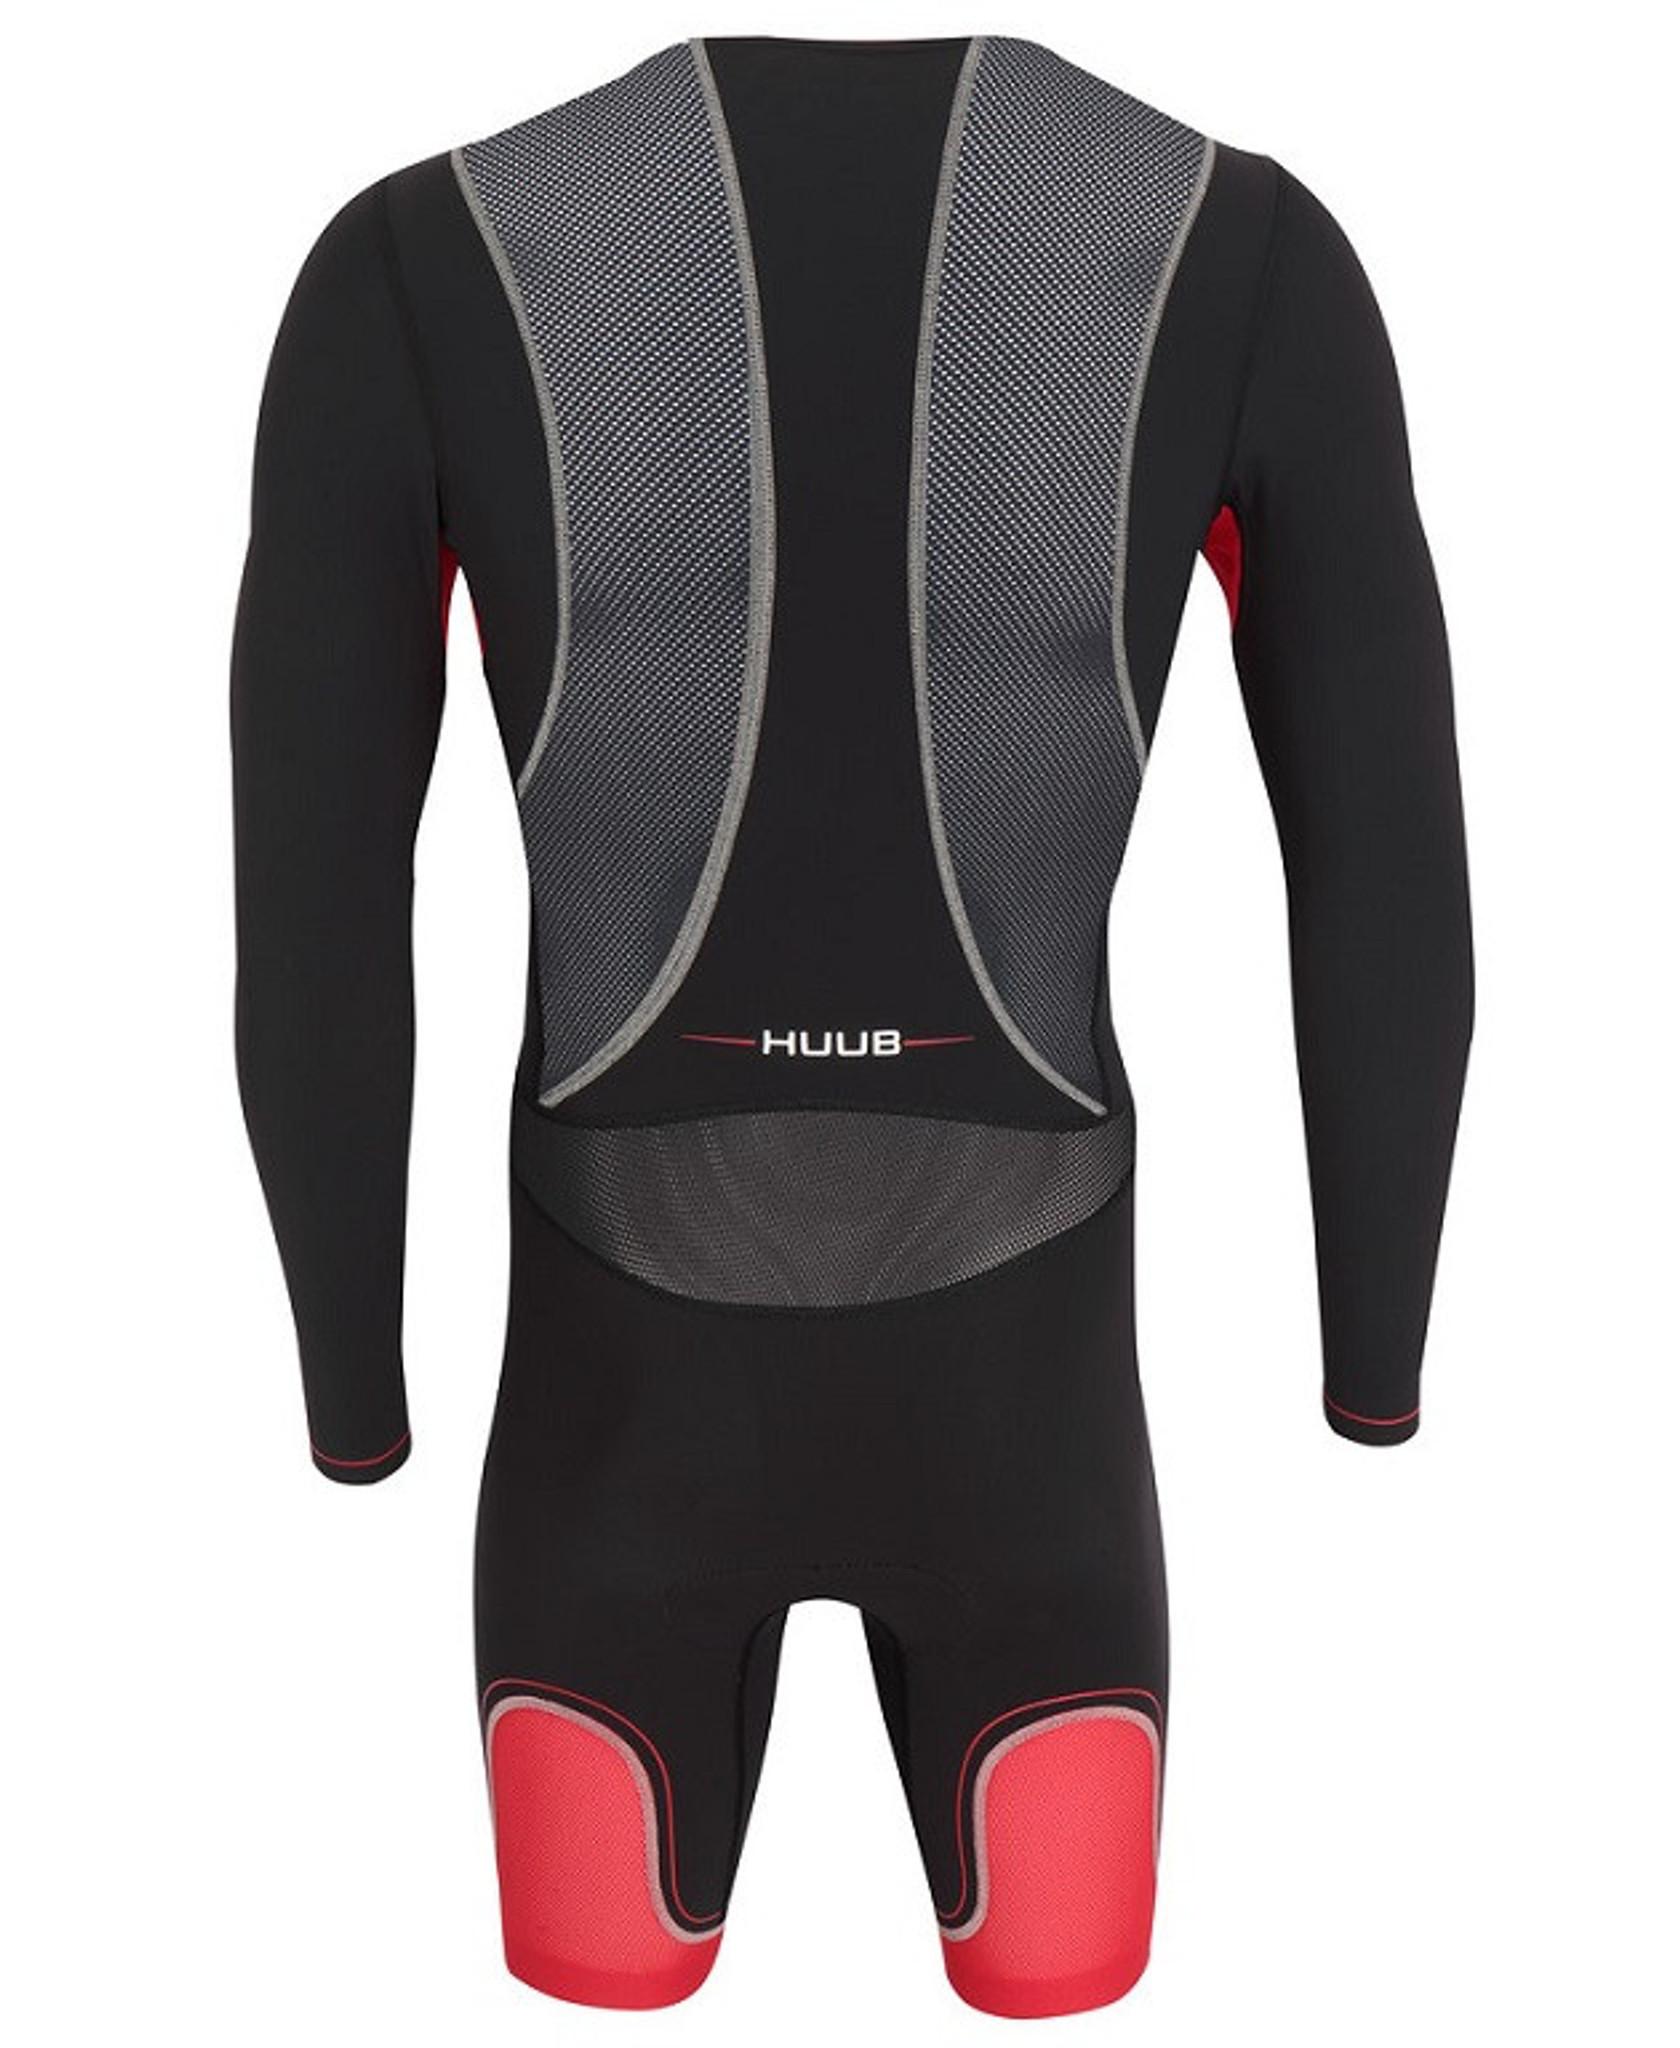 HUUB Wetsuit Shoulder Bag for Swimming Triathlon to fit Tri Suit Zip Up Storage